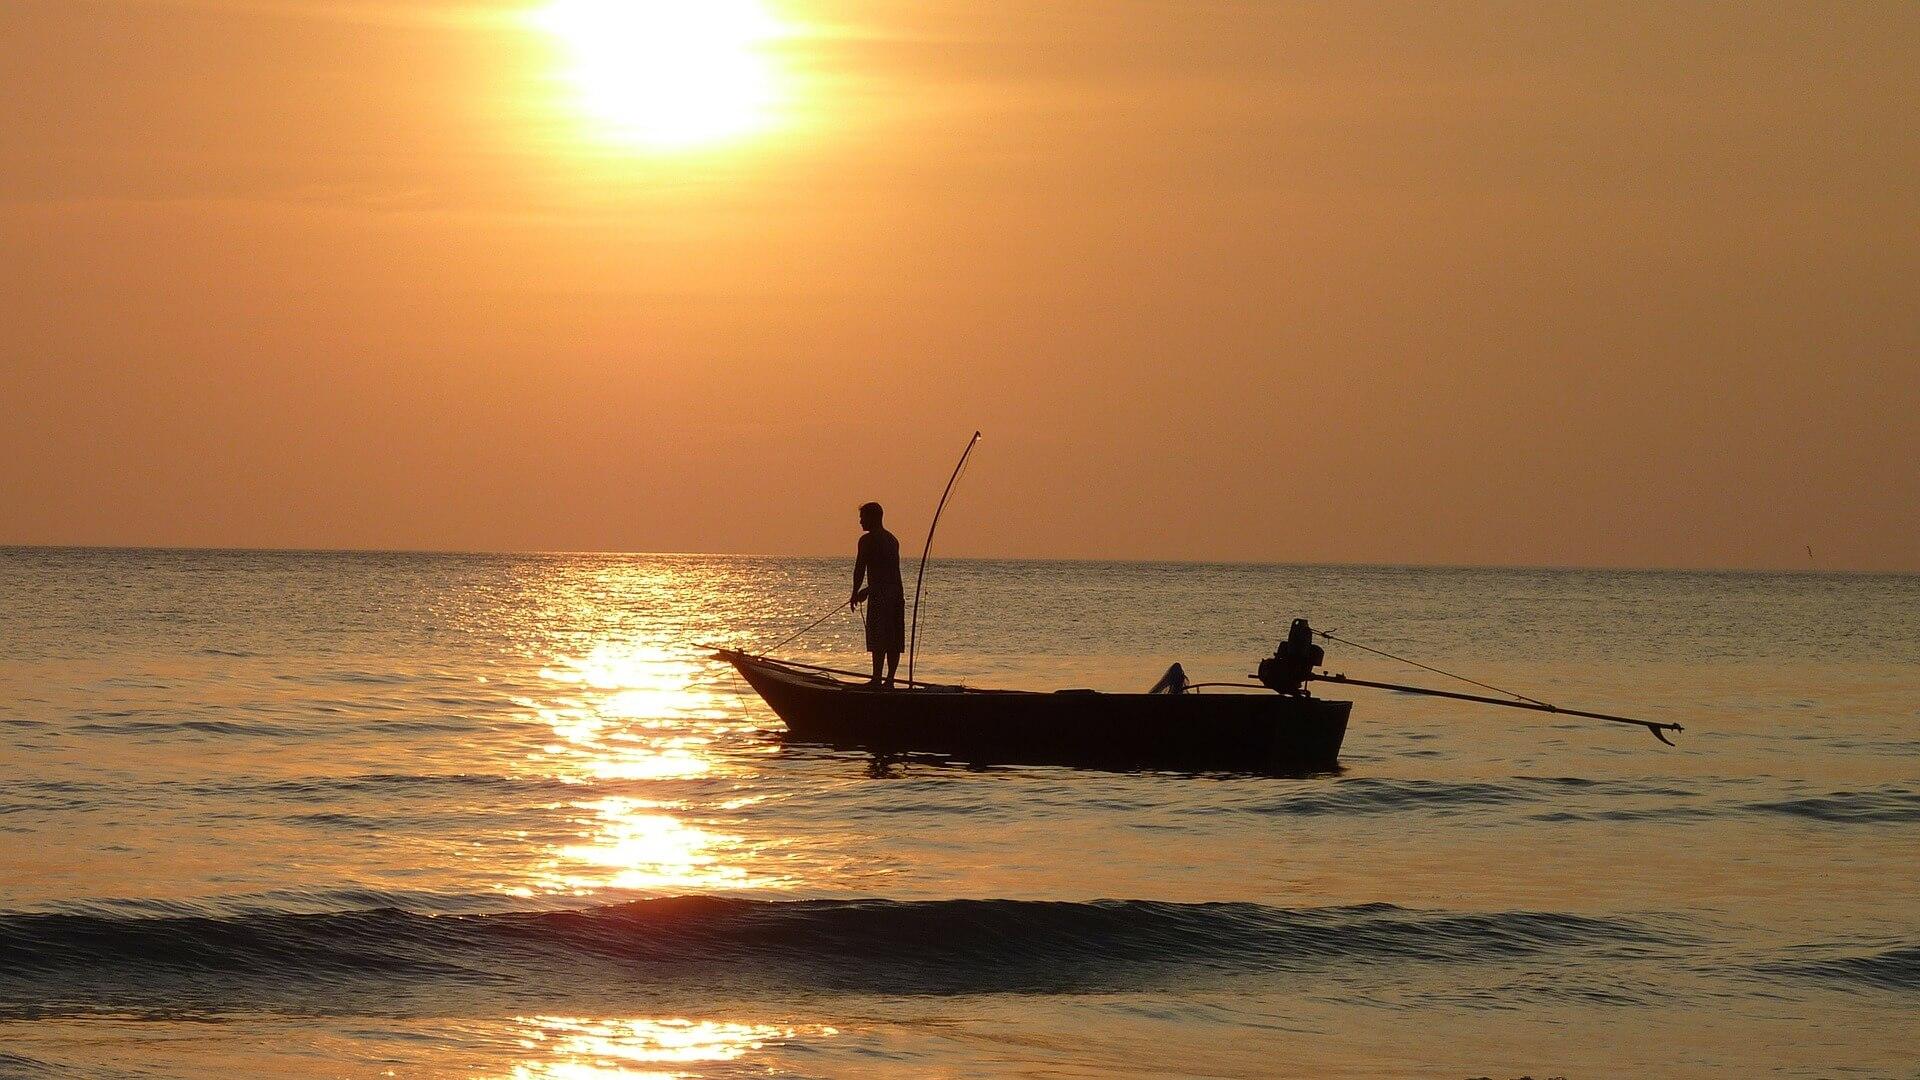 fisherman-209112_1920